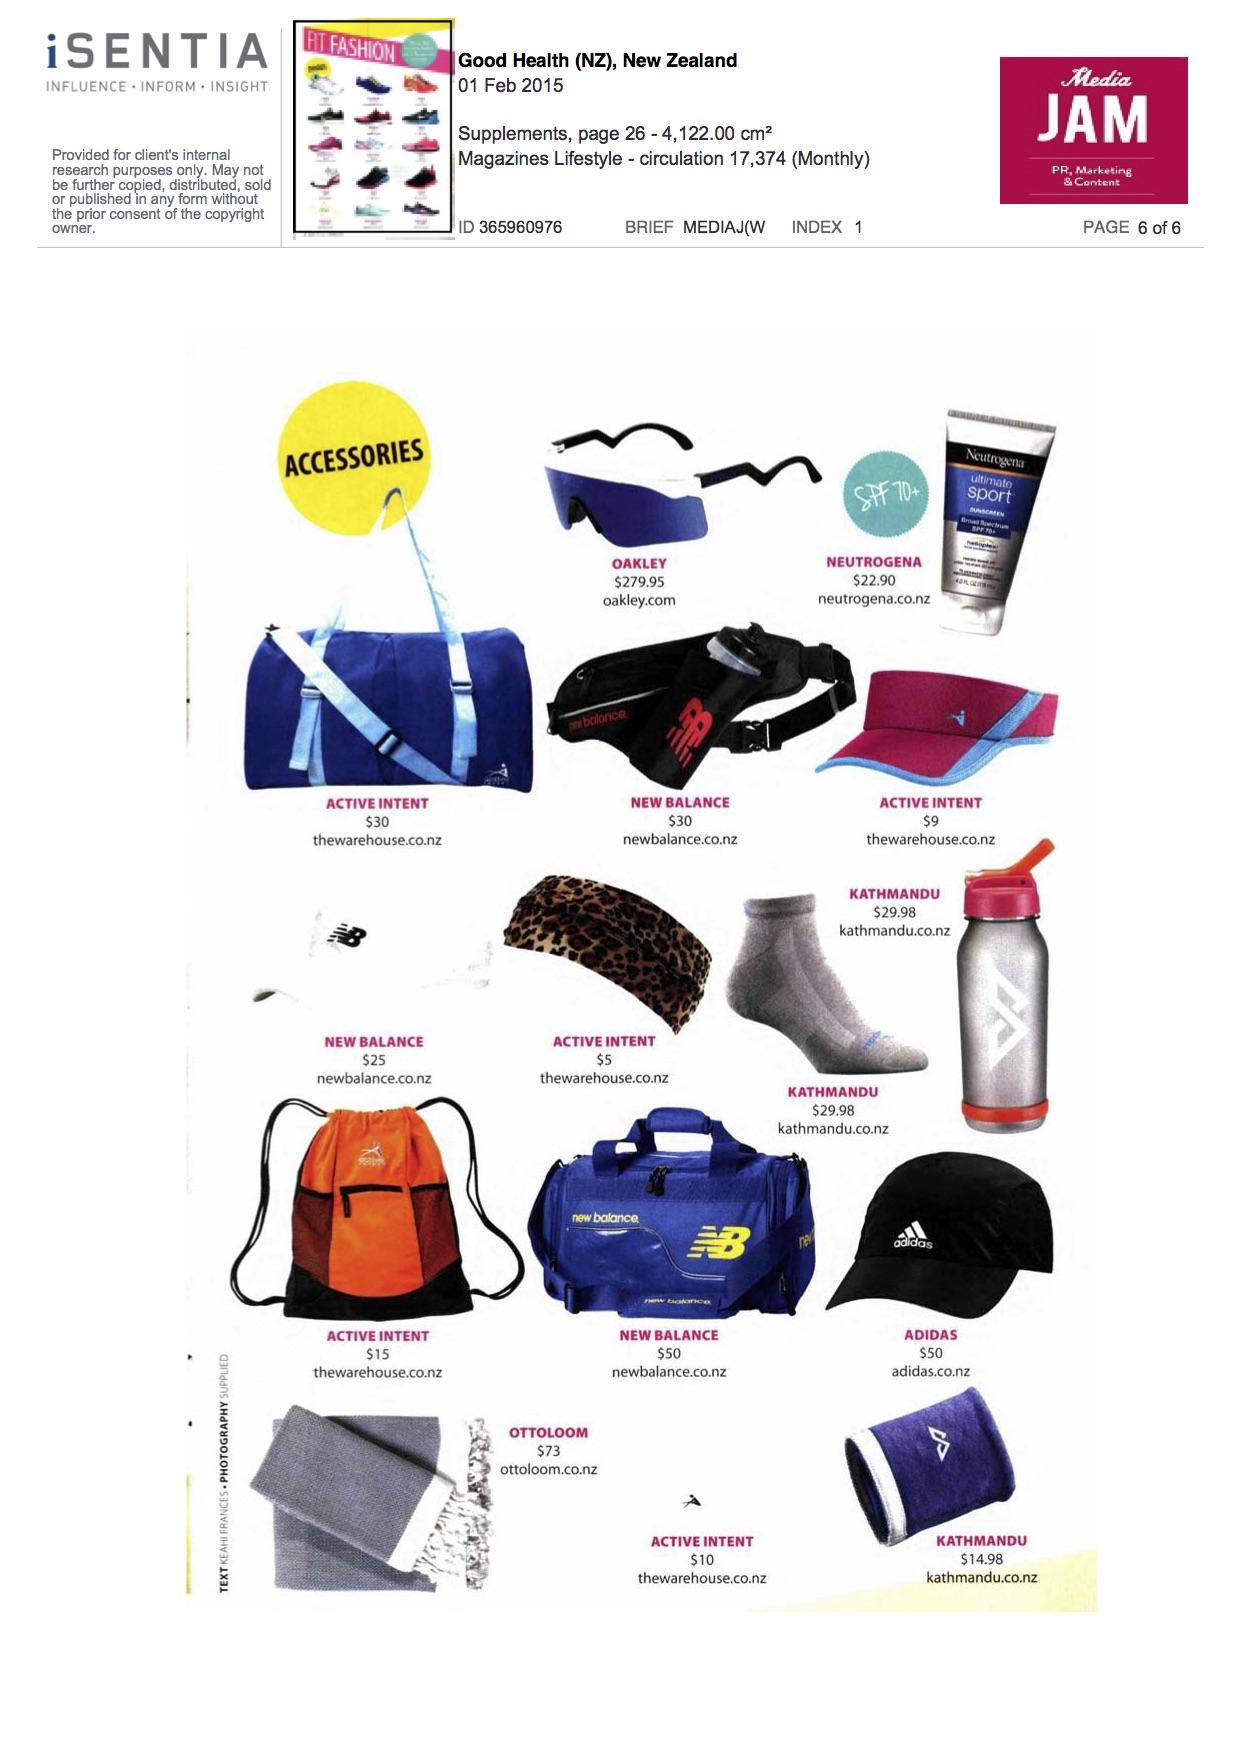 6Good Health Magazine Feb 2015 Fit Fashion Featuring New Balance.jpg